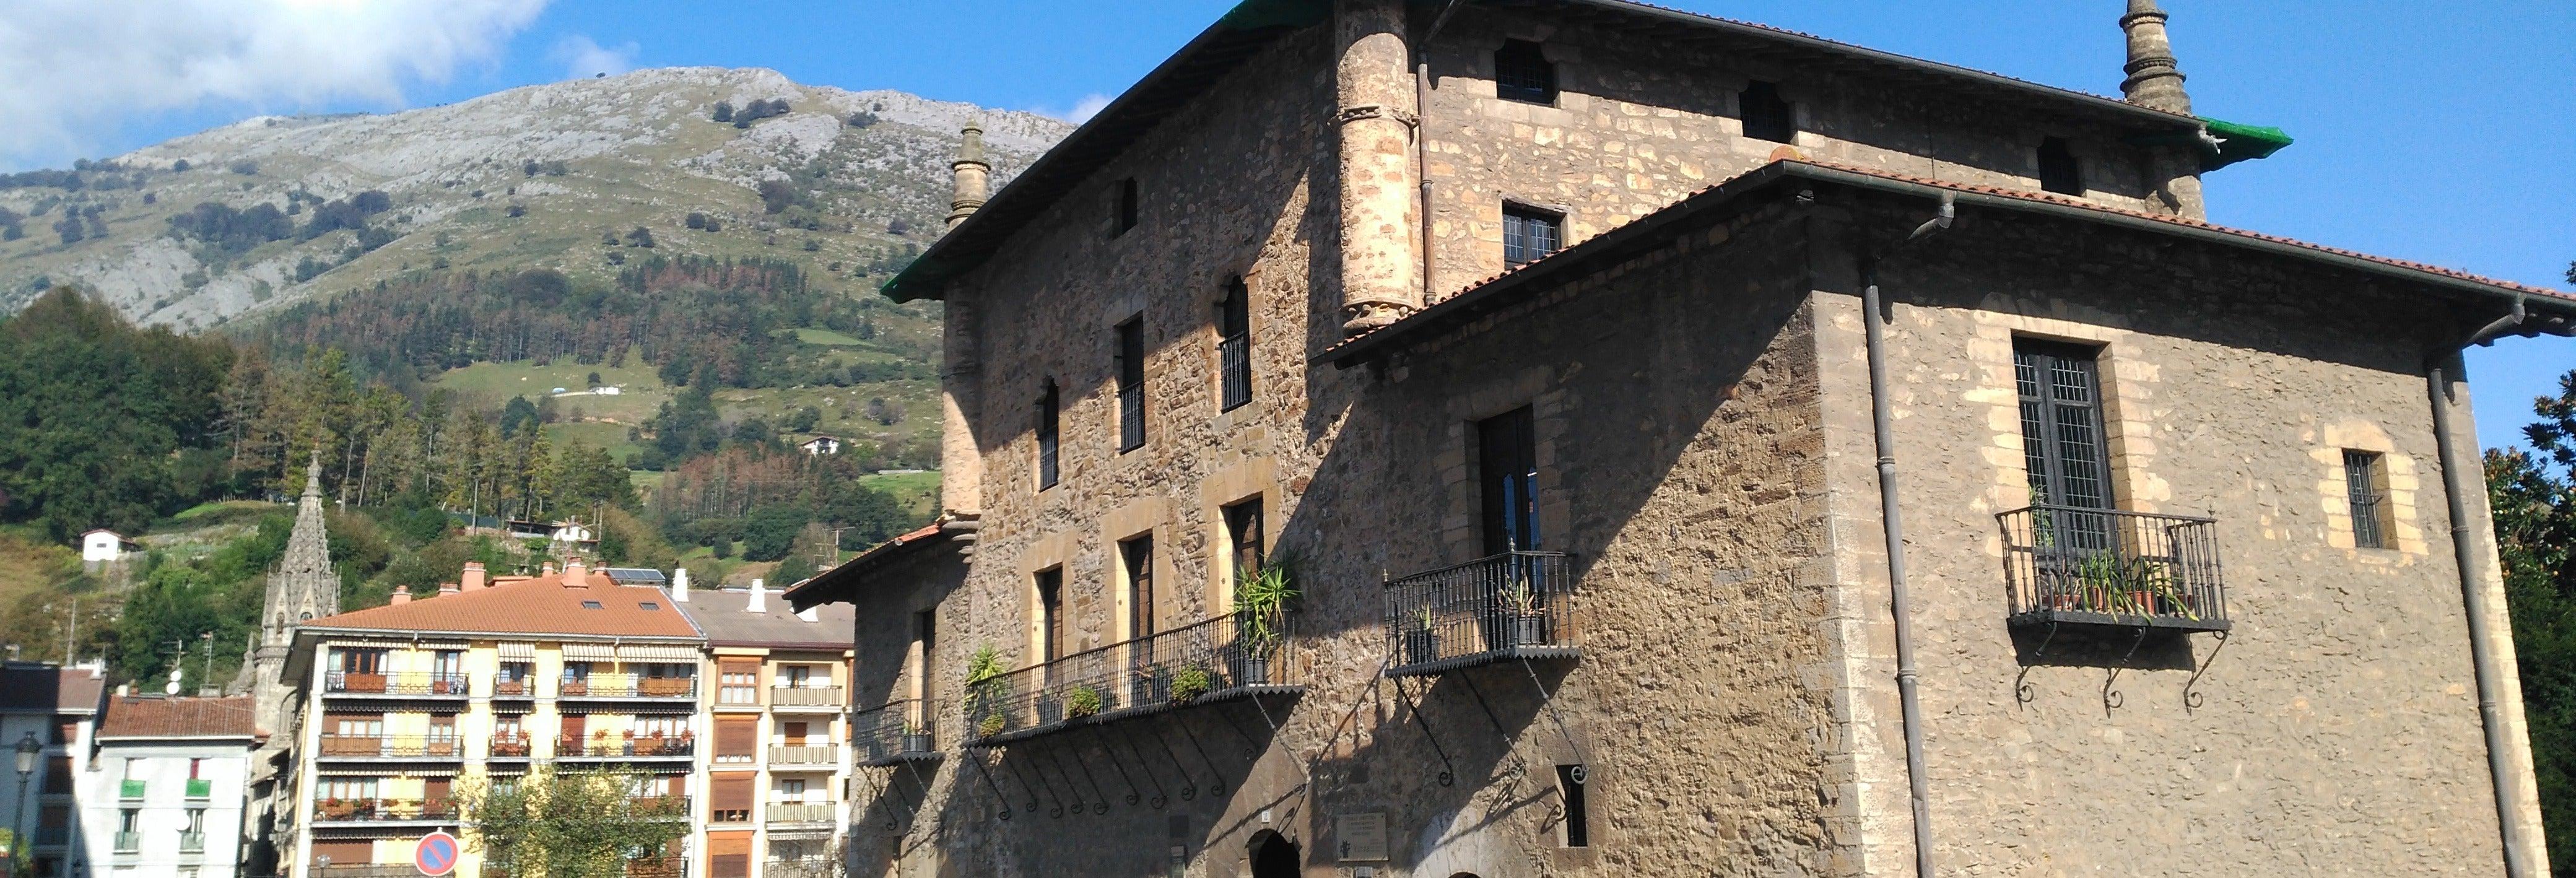 Visita guiada por Azpeitia +Capela da Soledad